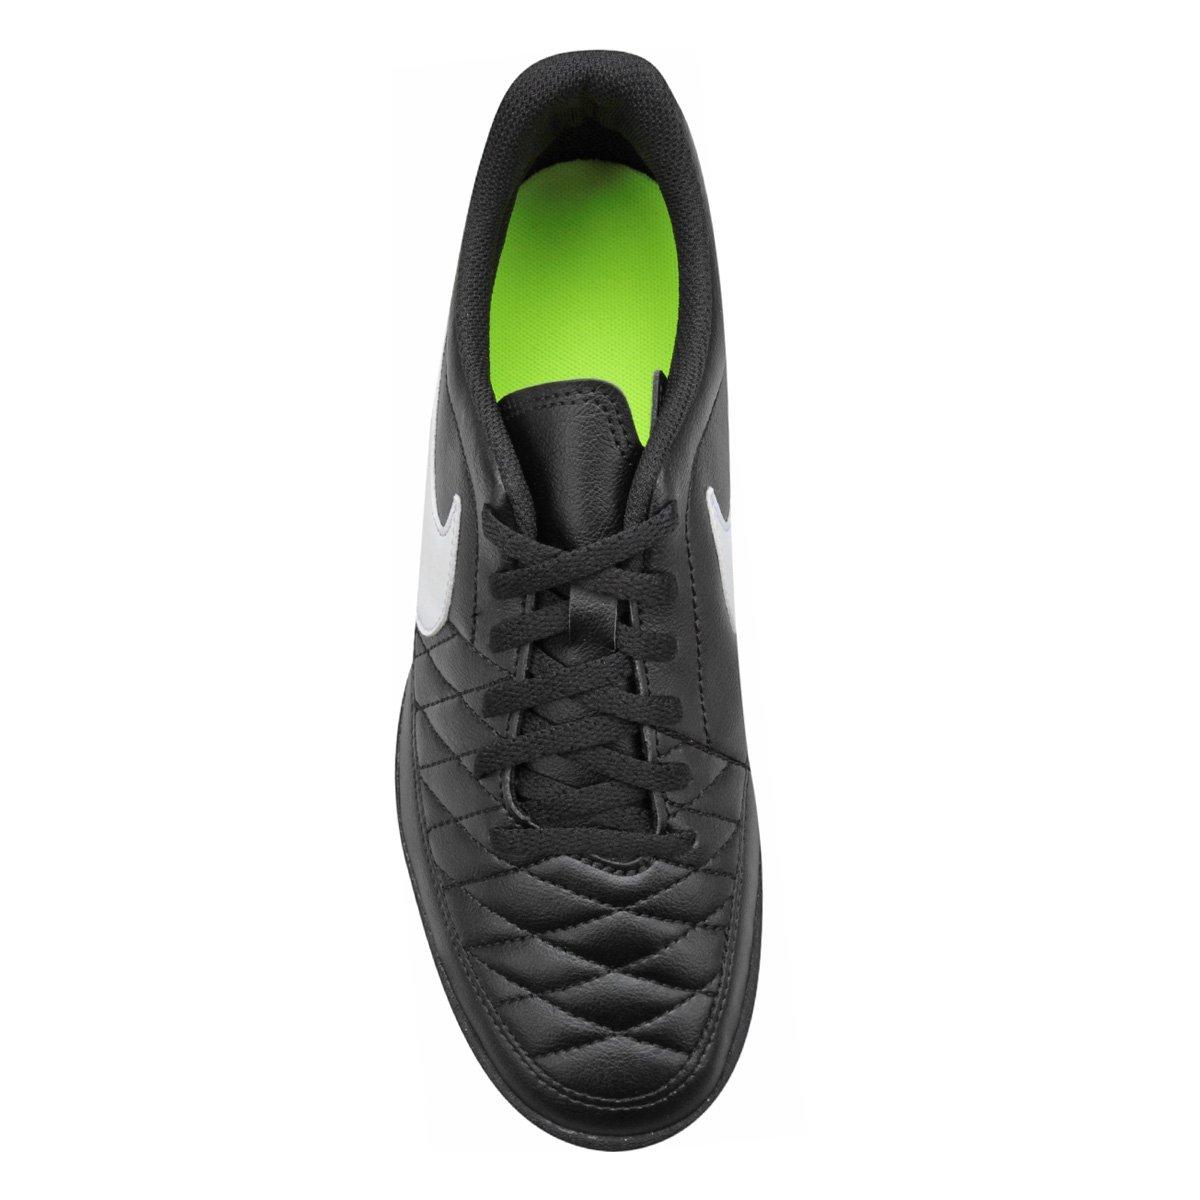 Chuteira Society Nike Majestry TF - Preto e Branco - Compre Agora ... 4a2ae92e69860